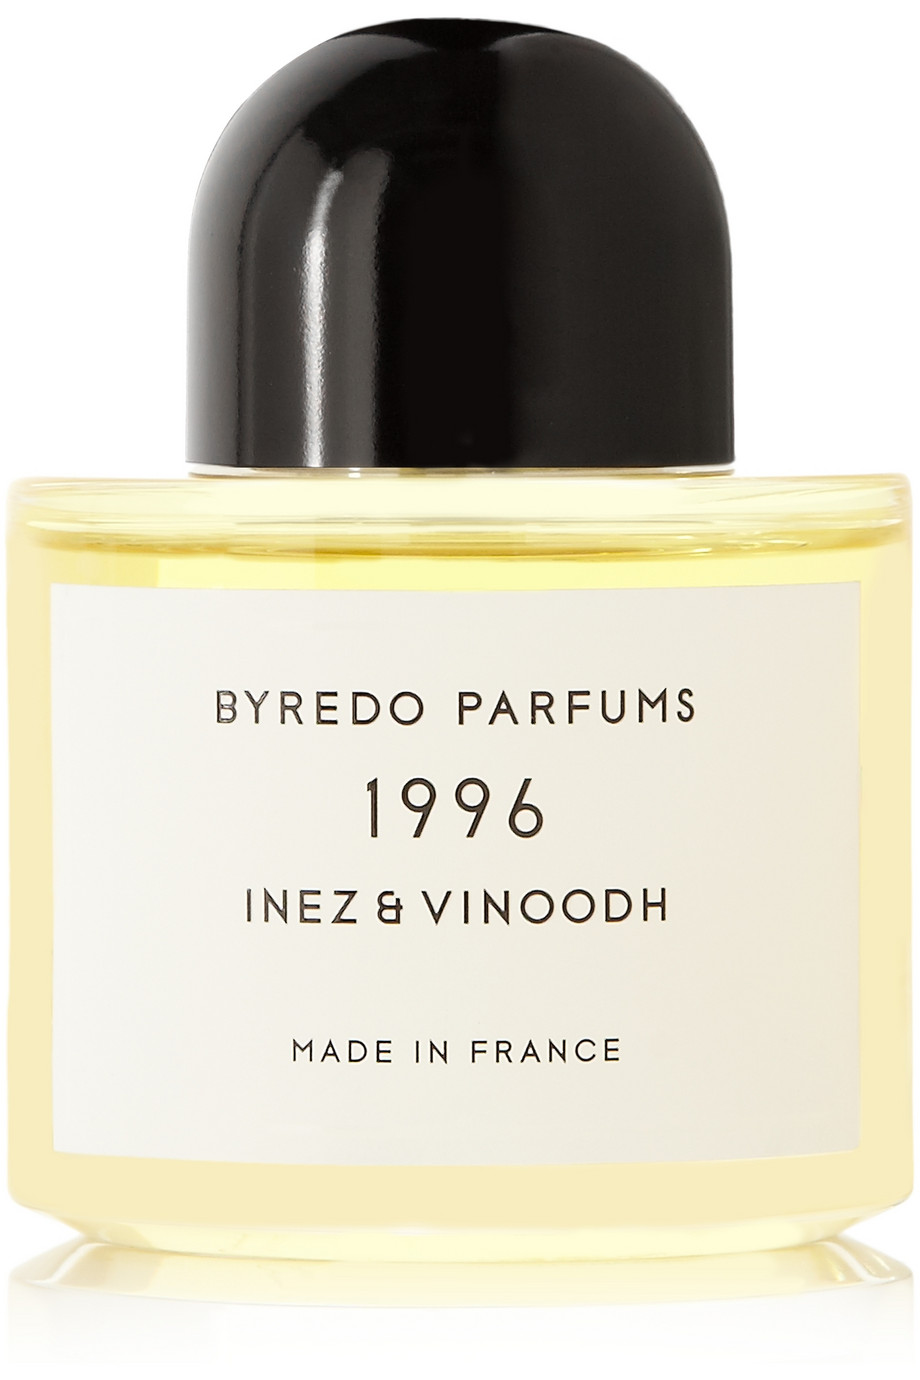 Byredo   Eau De Parfum - 1996, 50ml